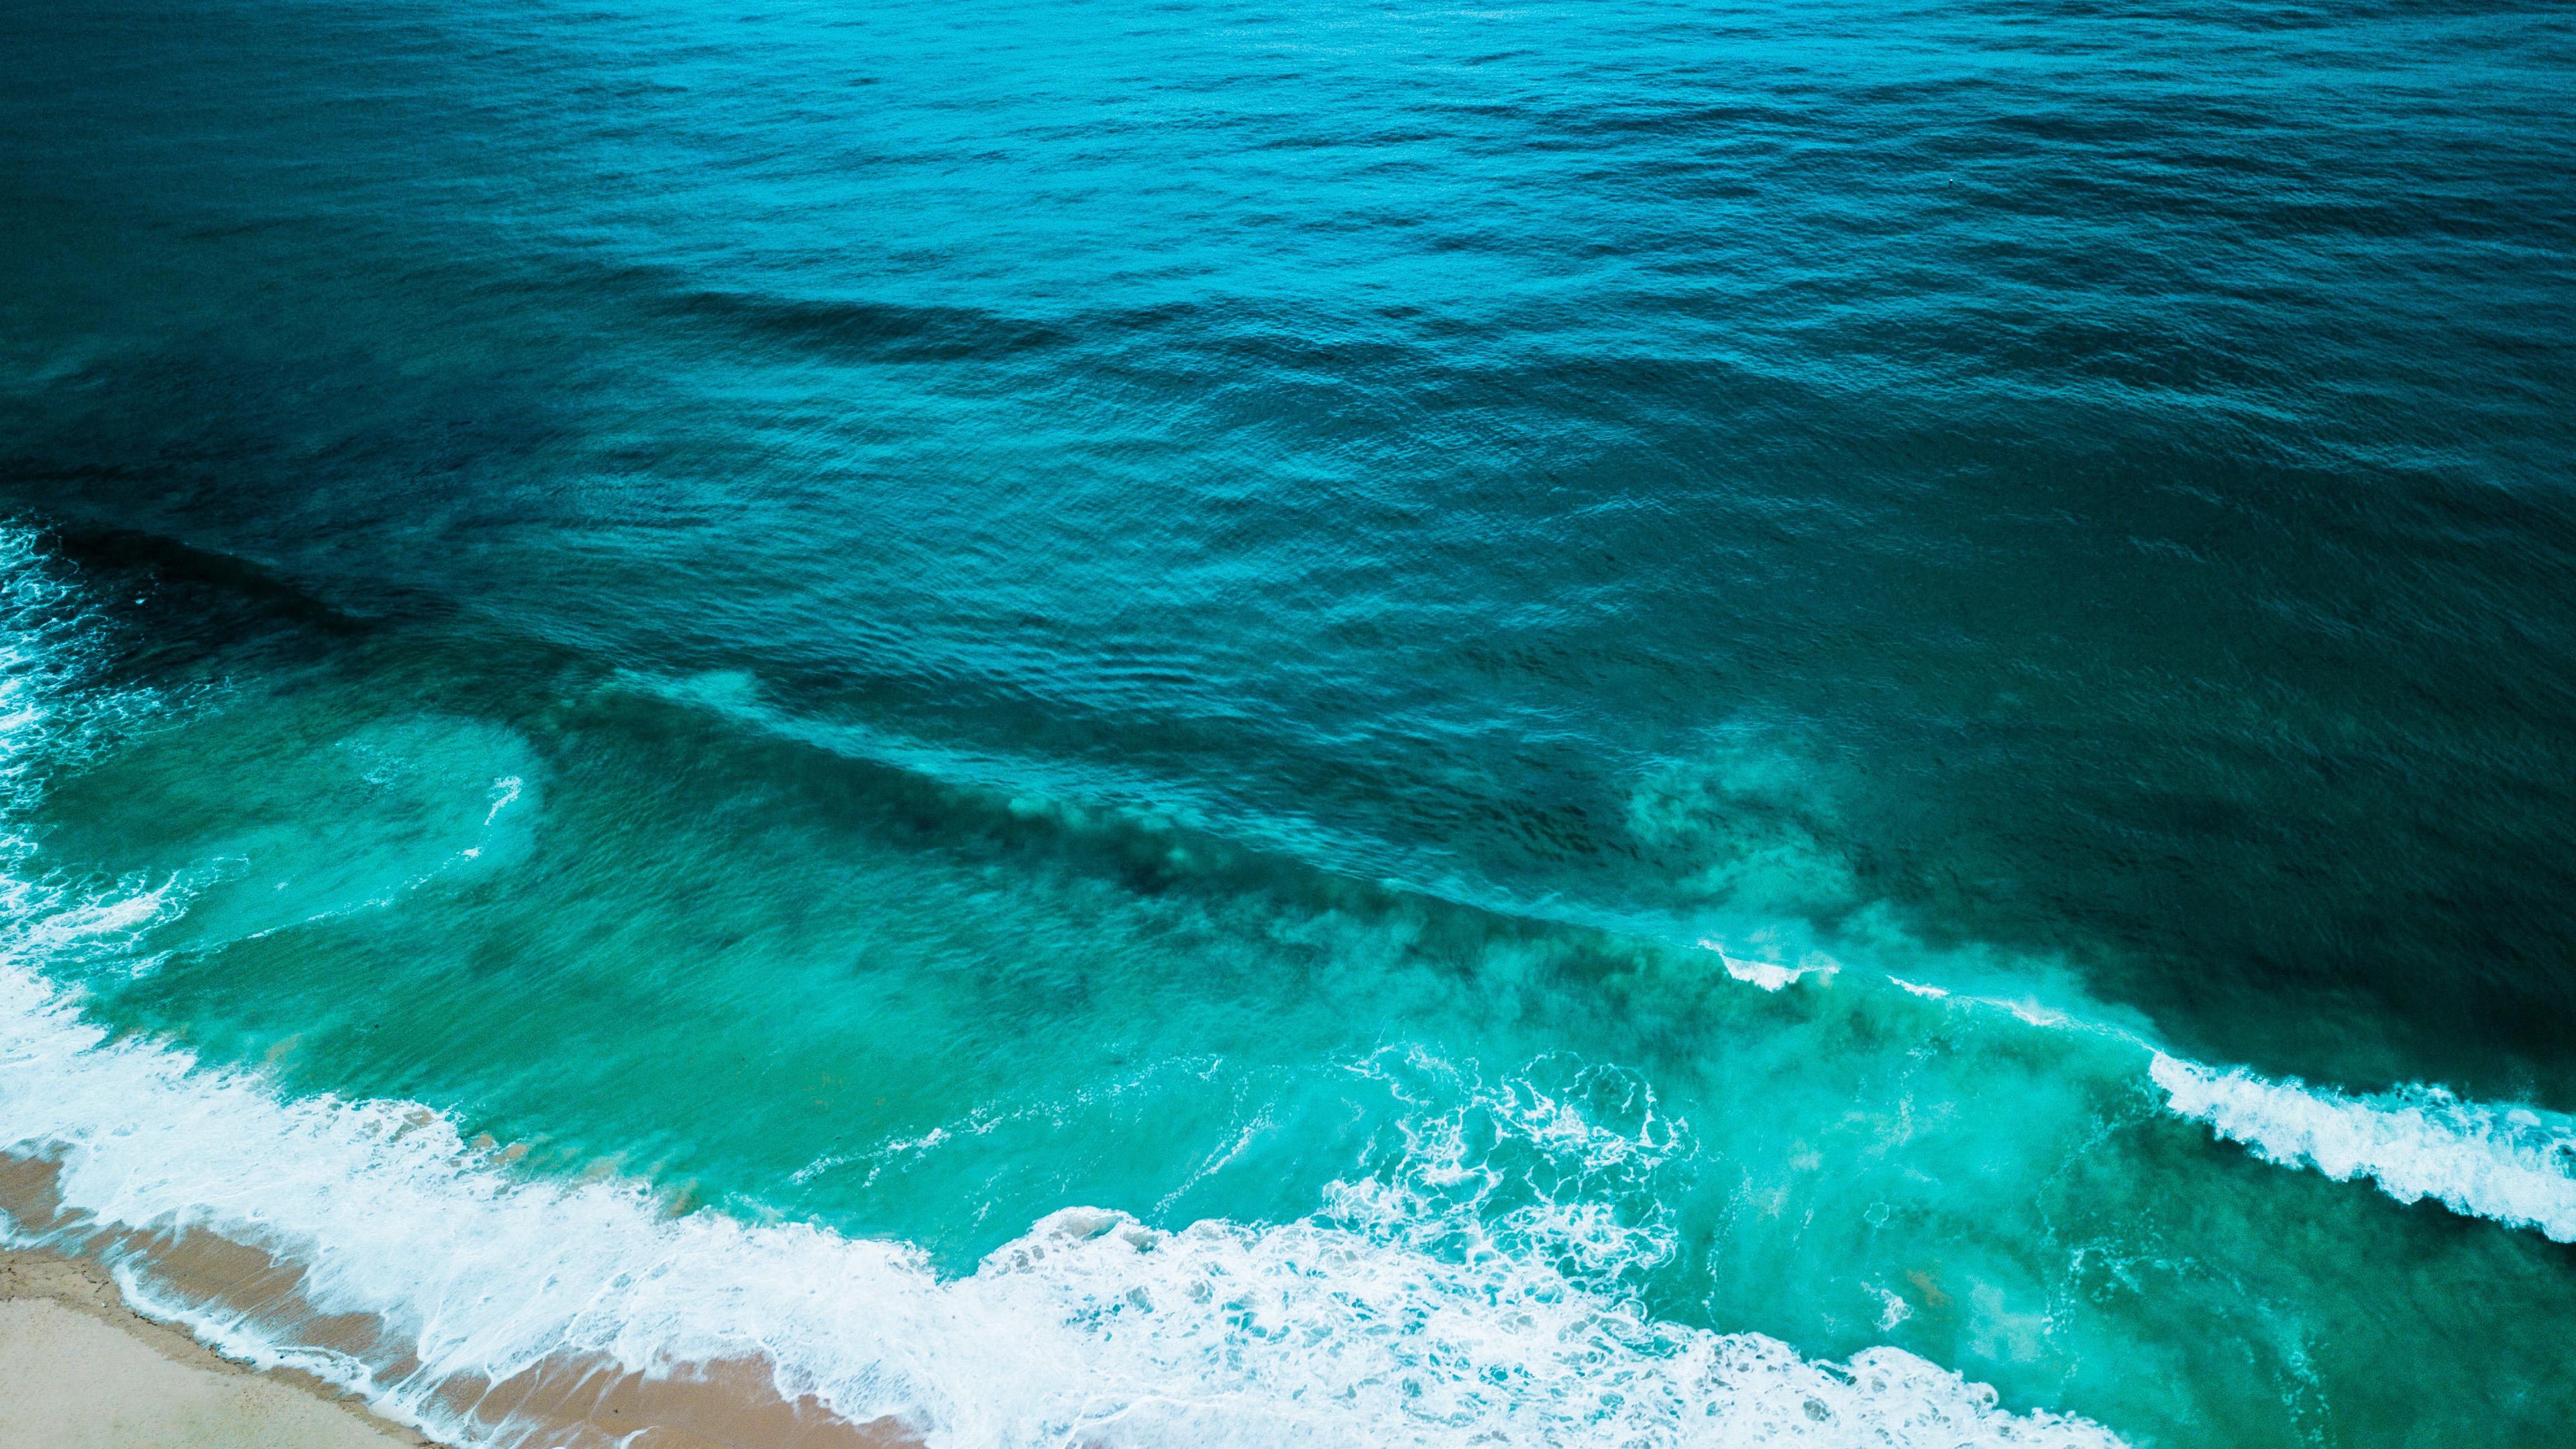 General 3840x2160 waves water ocean view beach wet nature